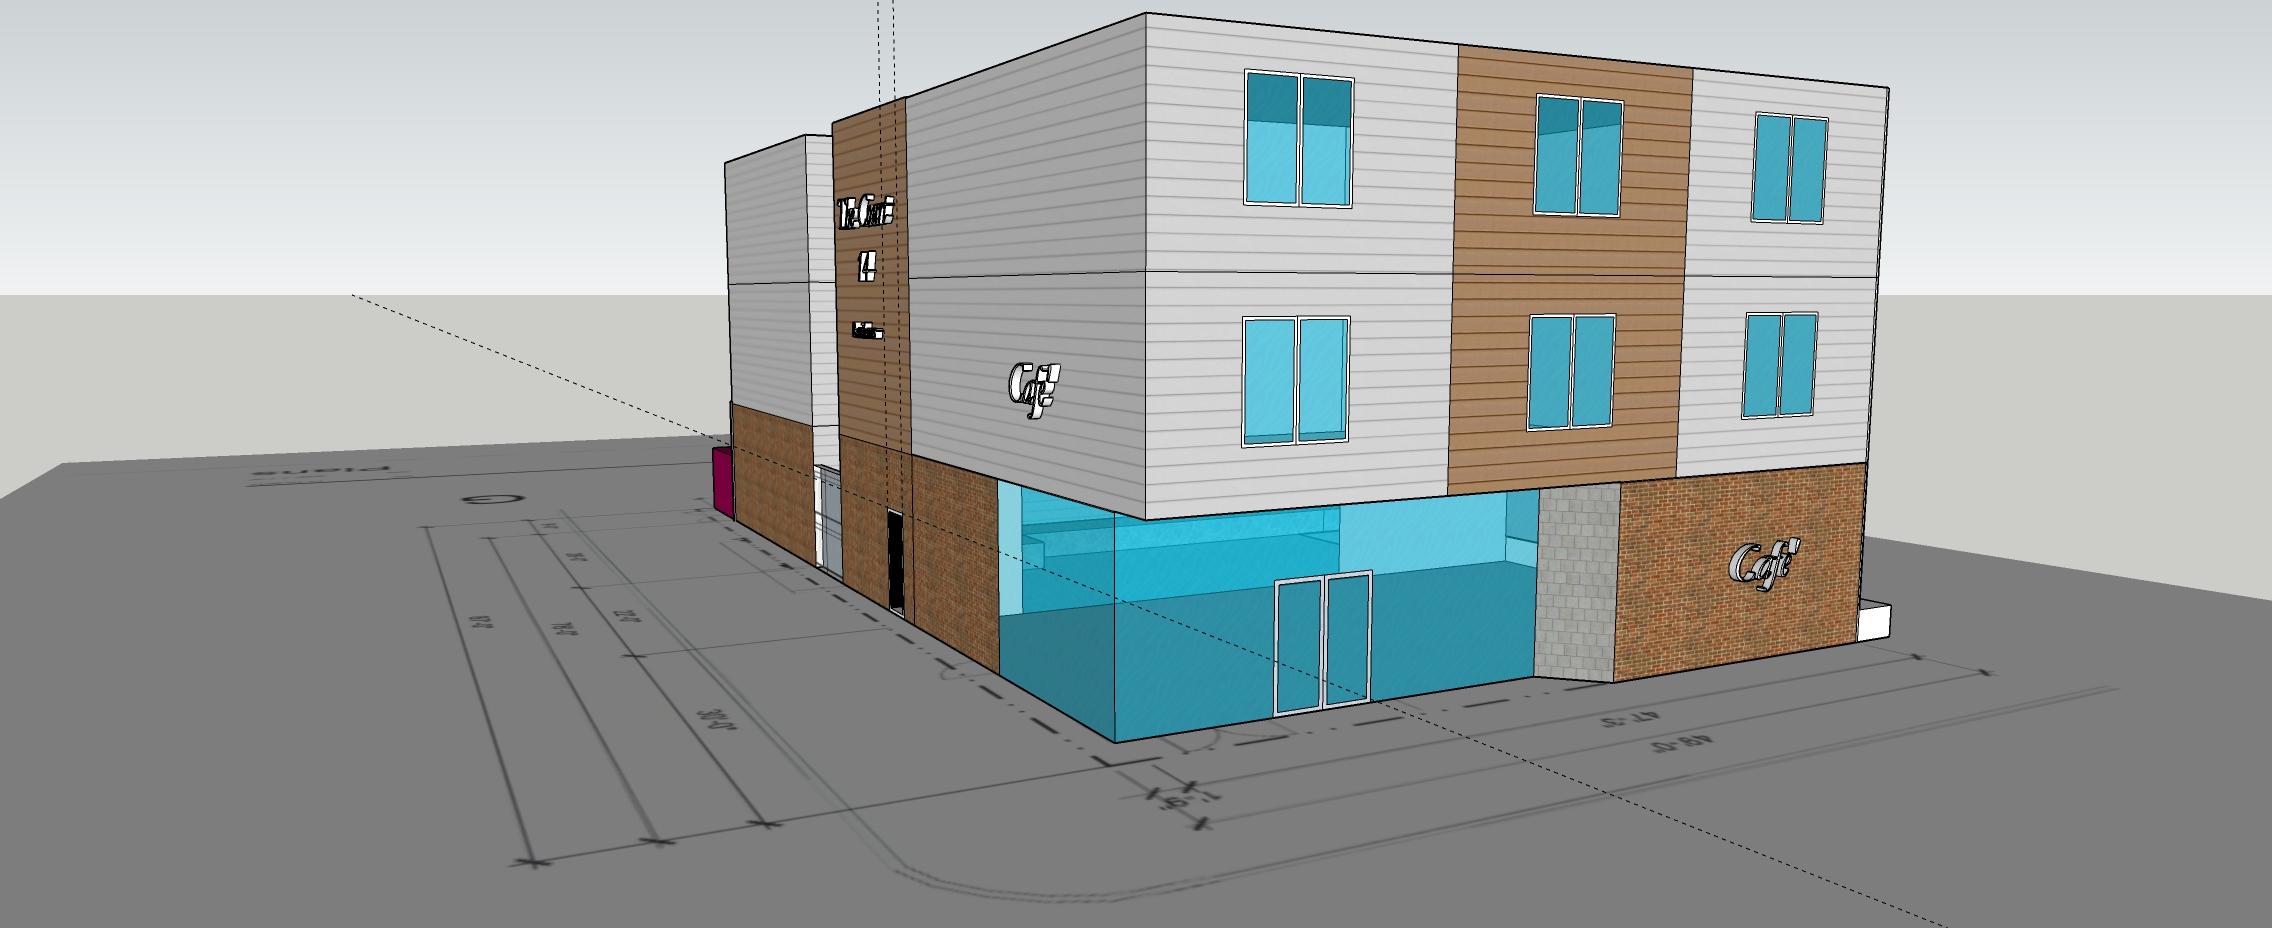 18th street rendering NEV.JPG